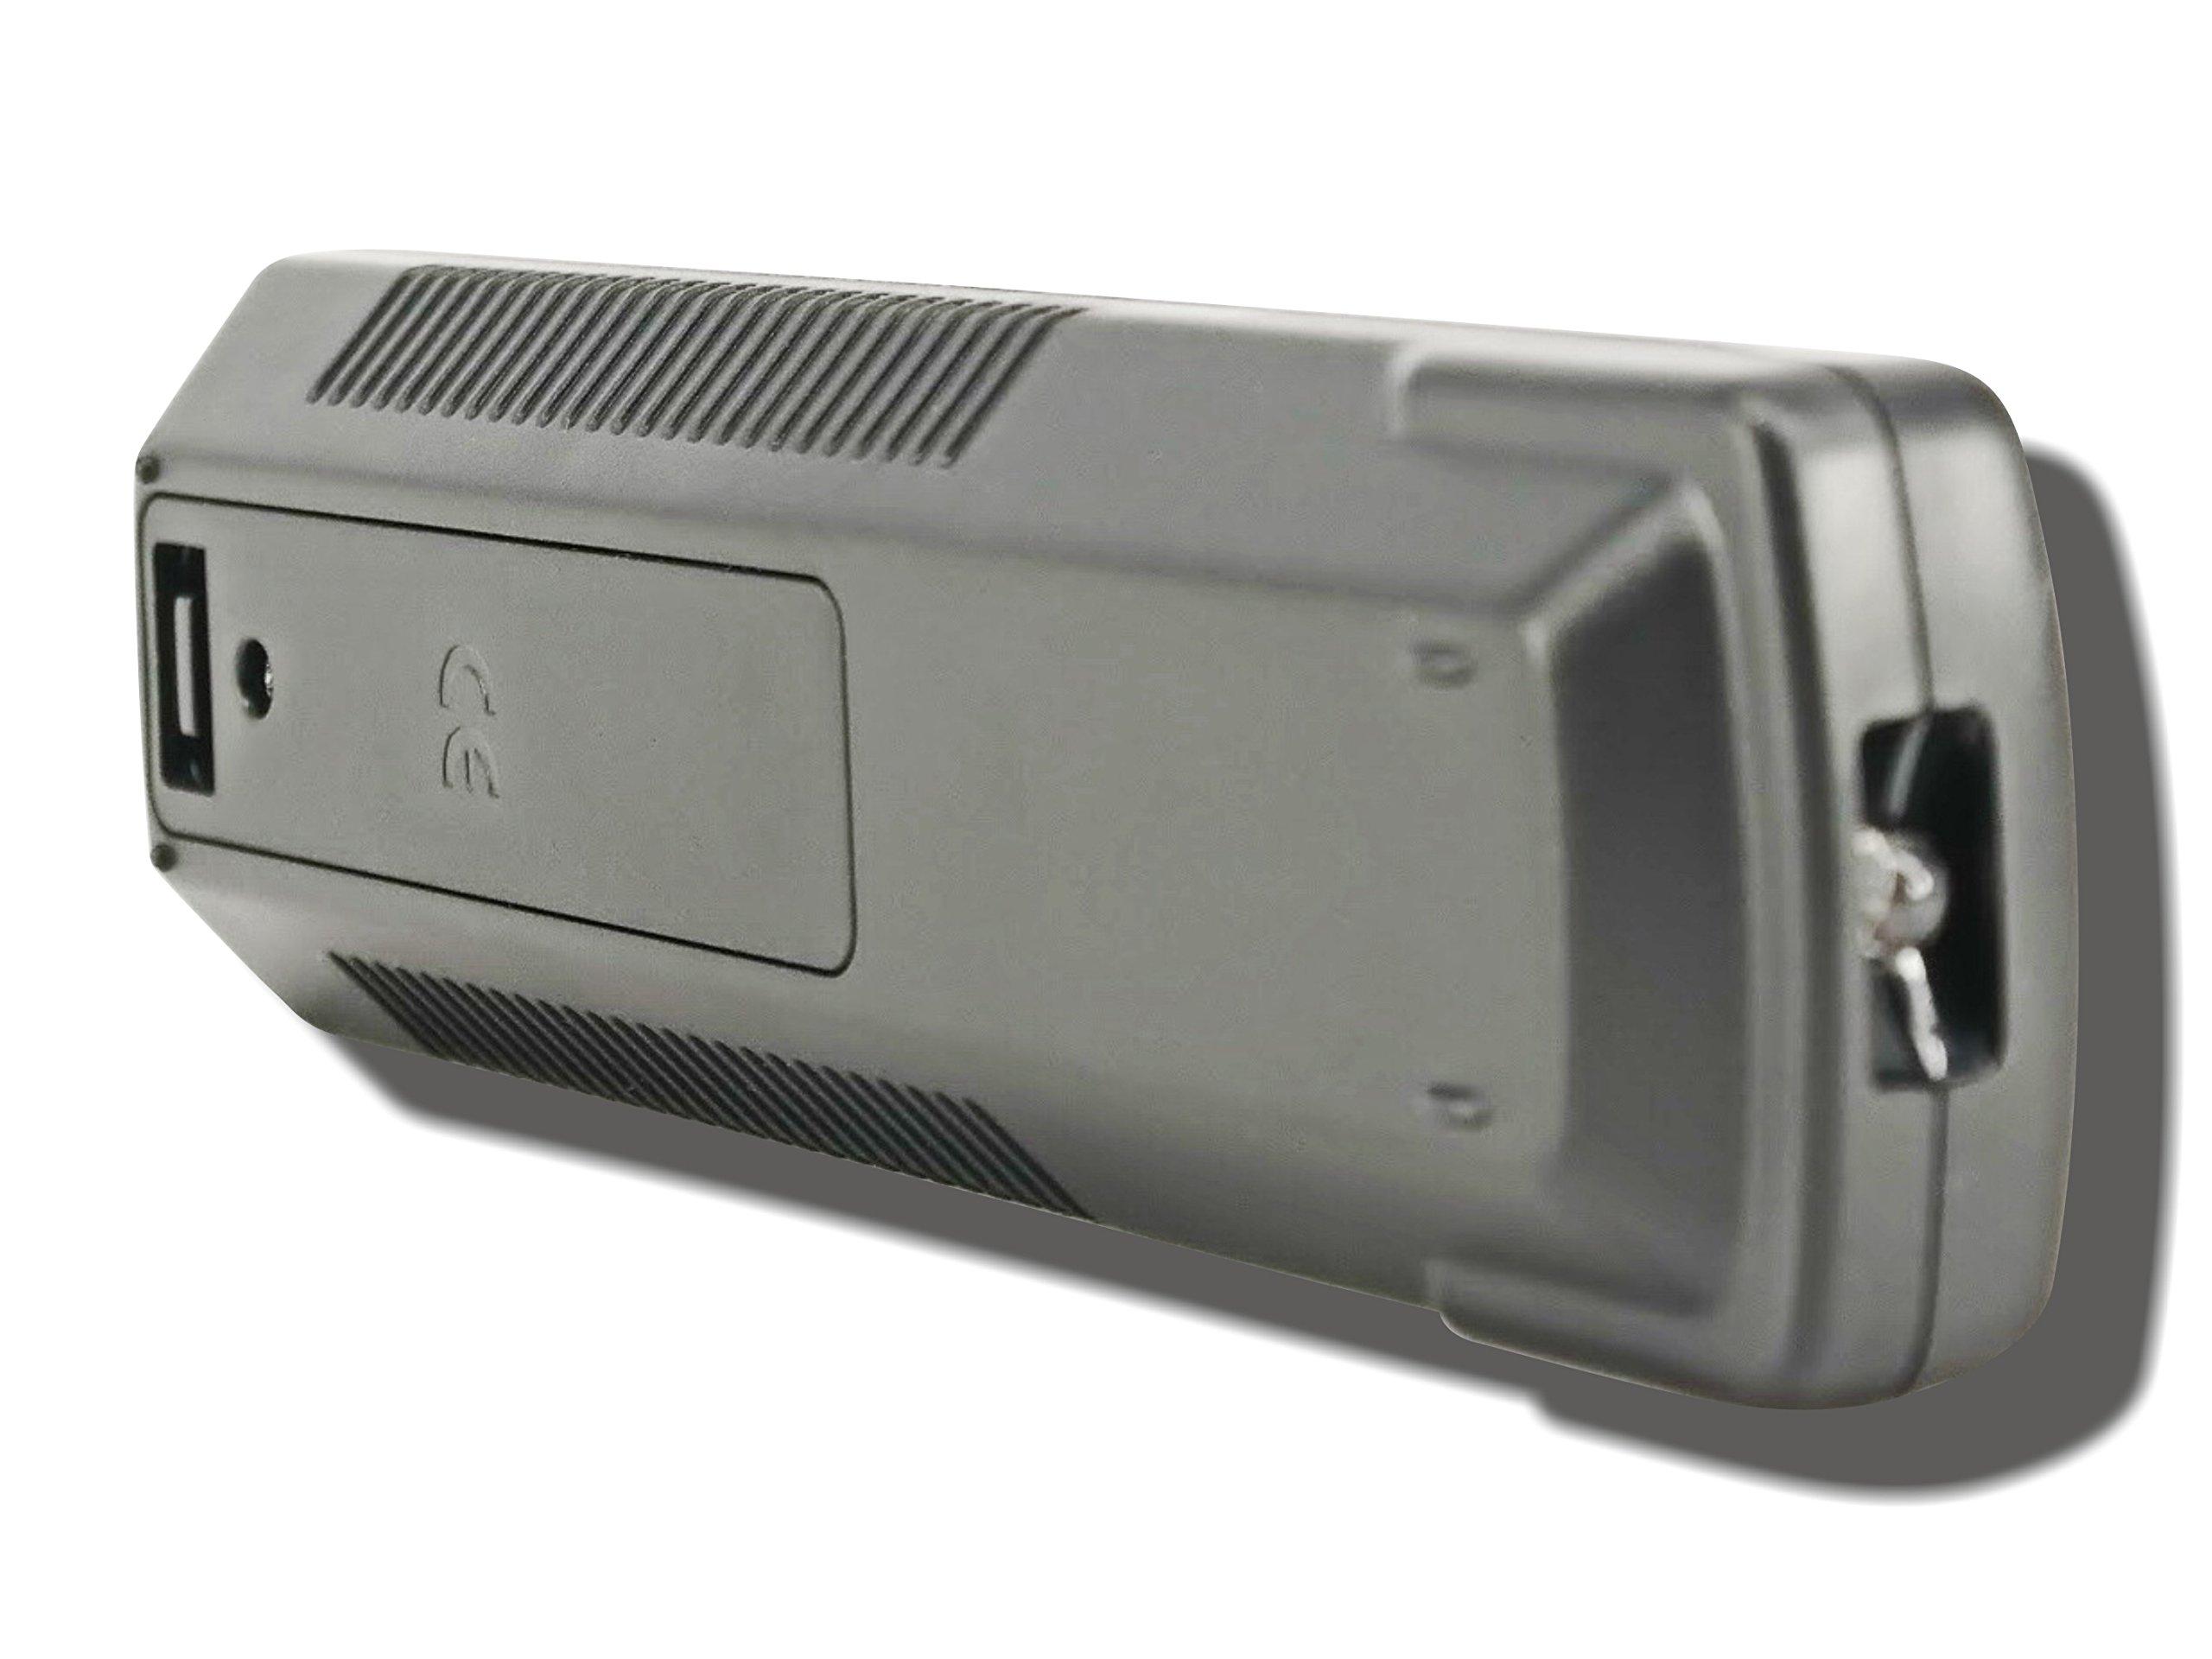 Sony DVP-CX995V TeKswamp Remote Control (Black) by Tekswamp (Image #7)